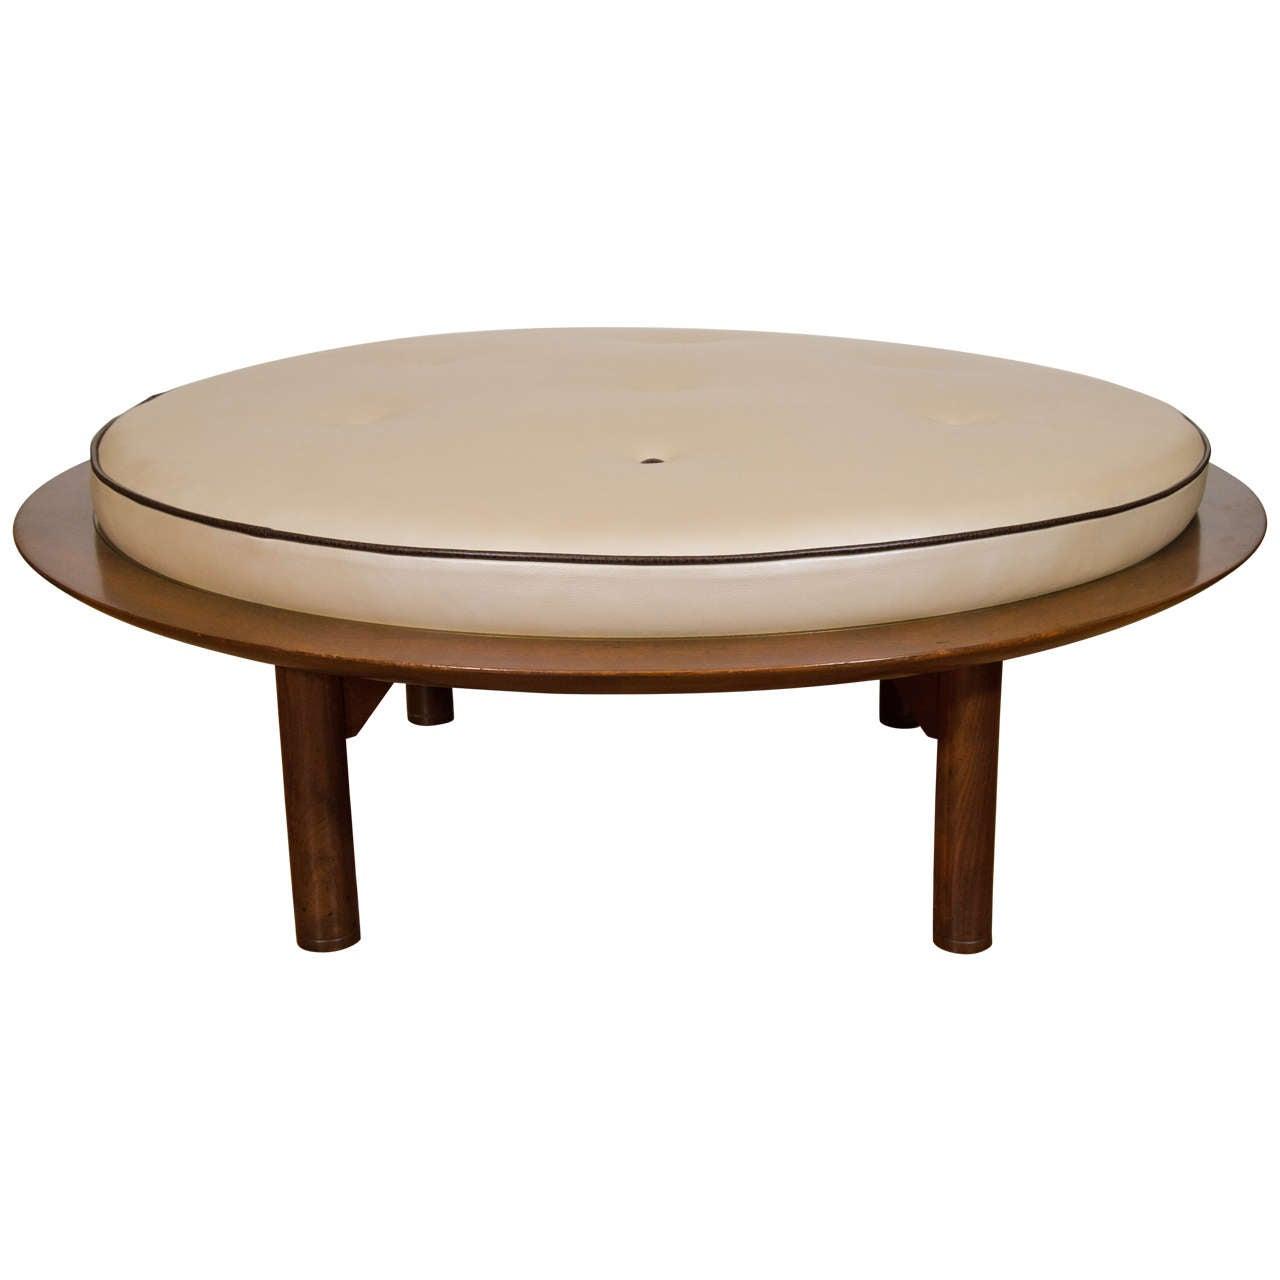 midcentury danish modern round leather and wood ottoman at stdibs - midcentury danish modern round leather and wood ottoman